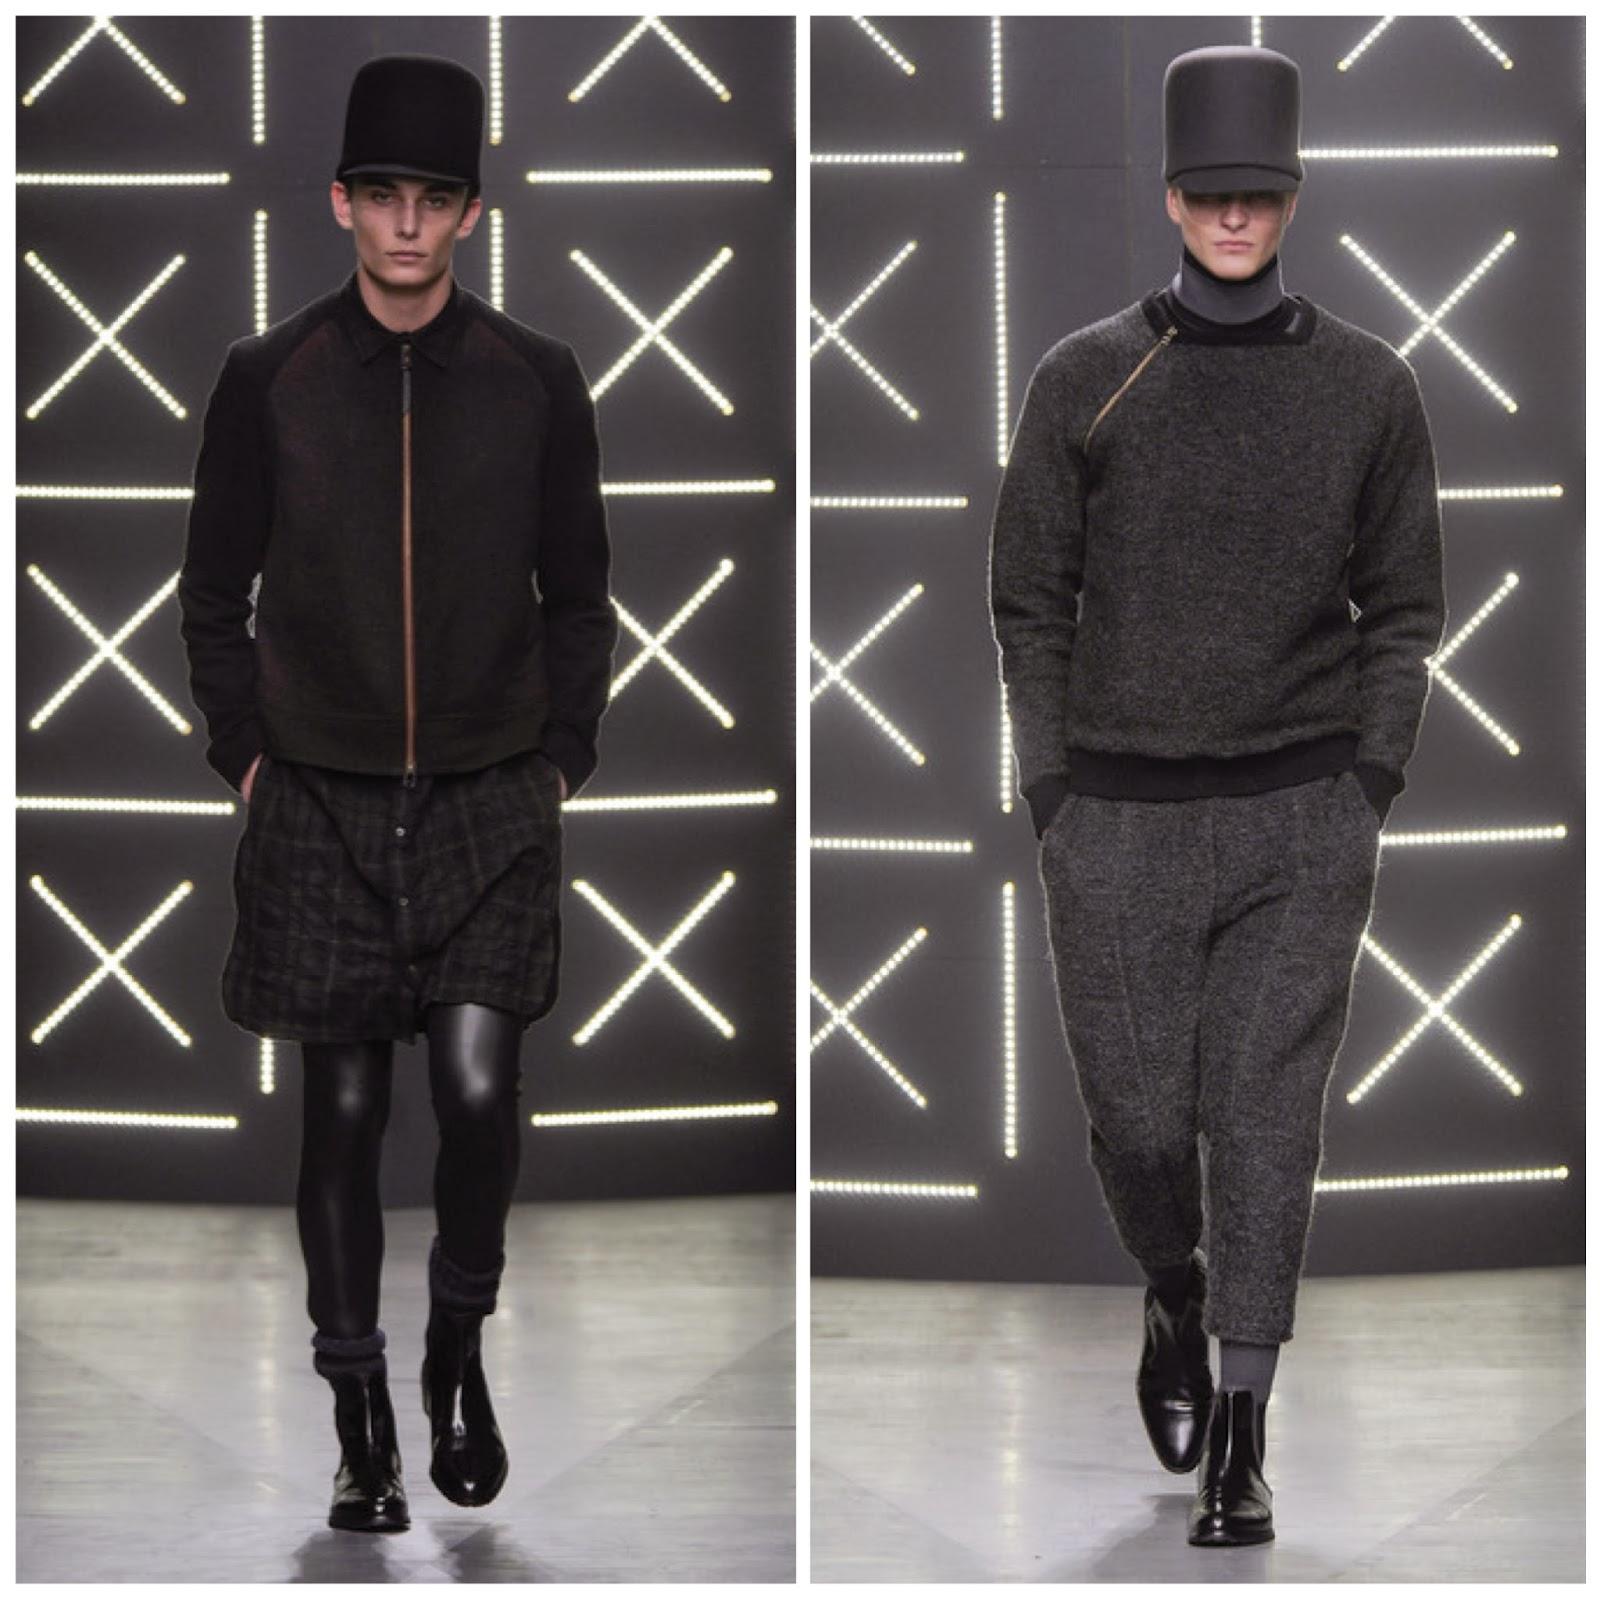 mybelonging-nyfw-fw14-robert-geller-menswear-collection.jpg